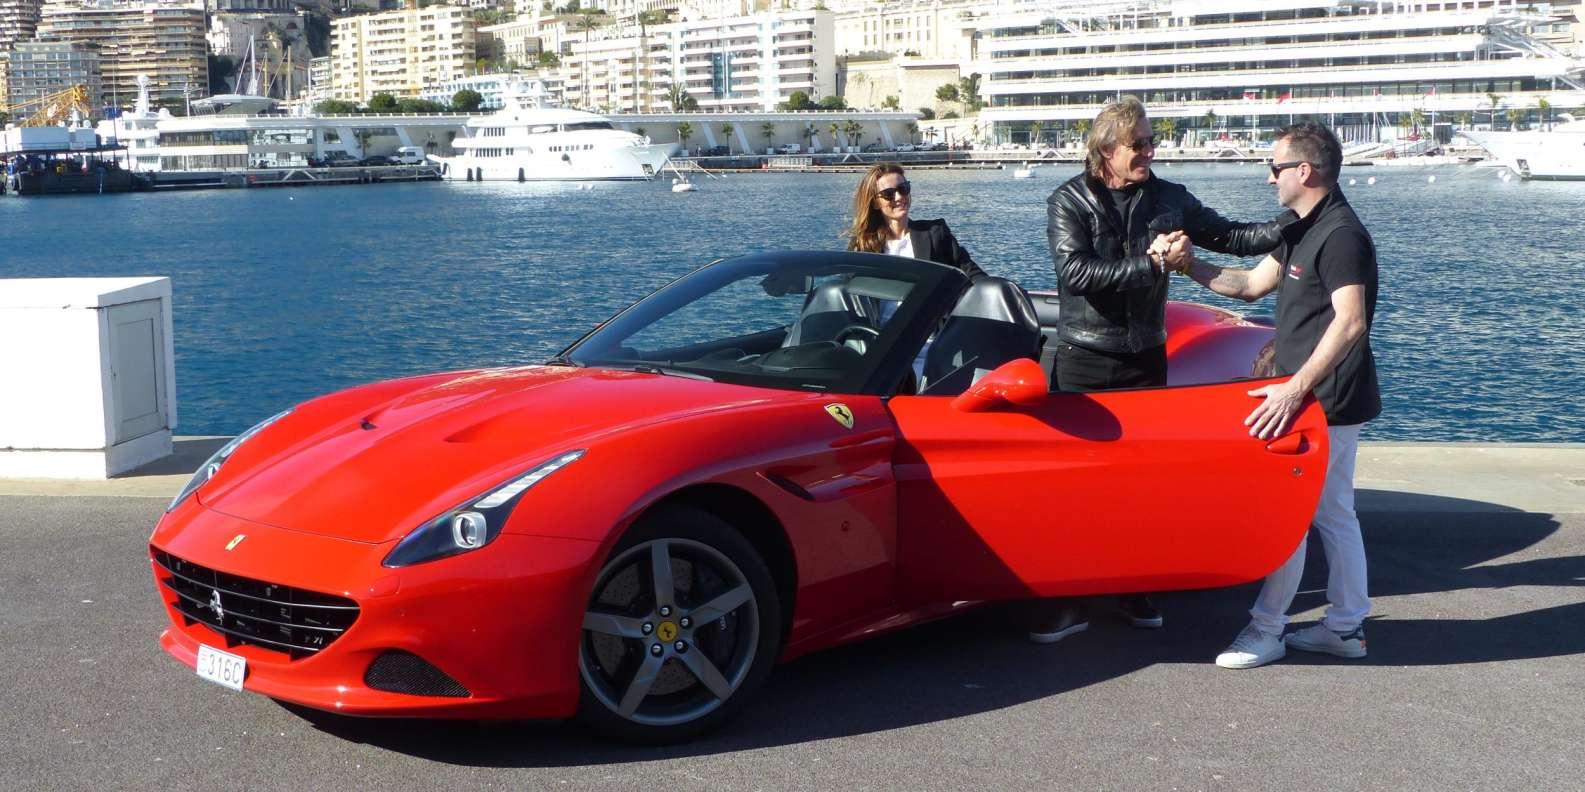 Monaco 30 Or 60 Minute Ferrari California T Experience Getyourguide